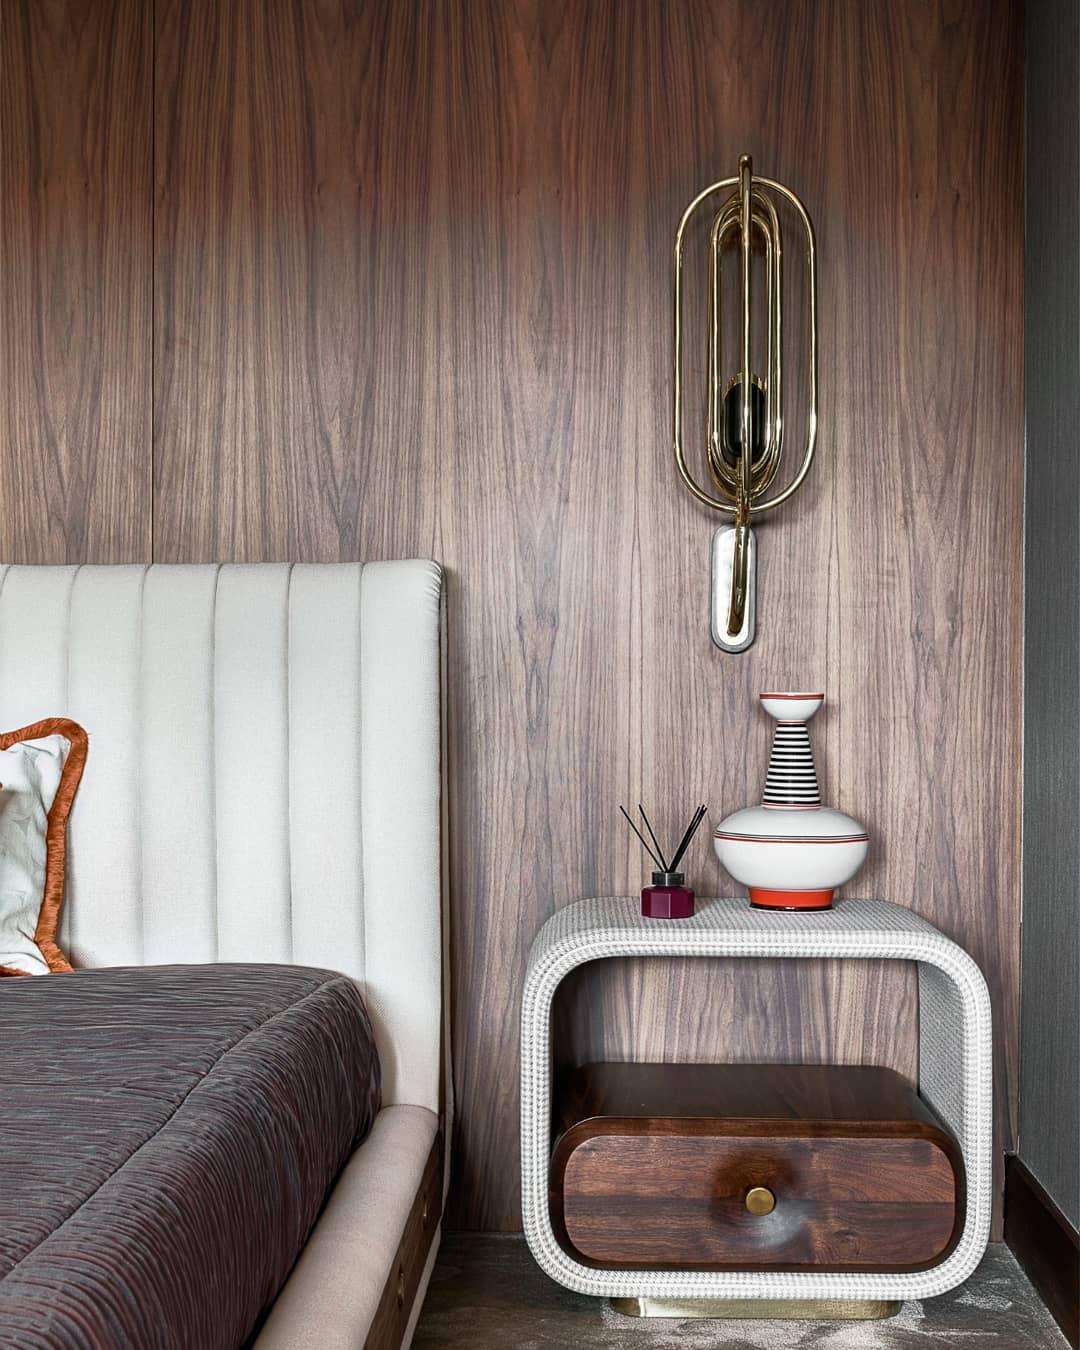 bedroom design inspiration- The Bedroom Décor